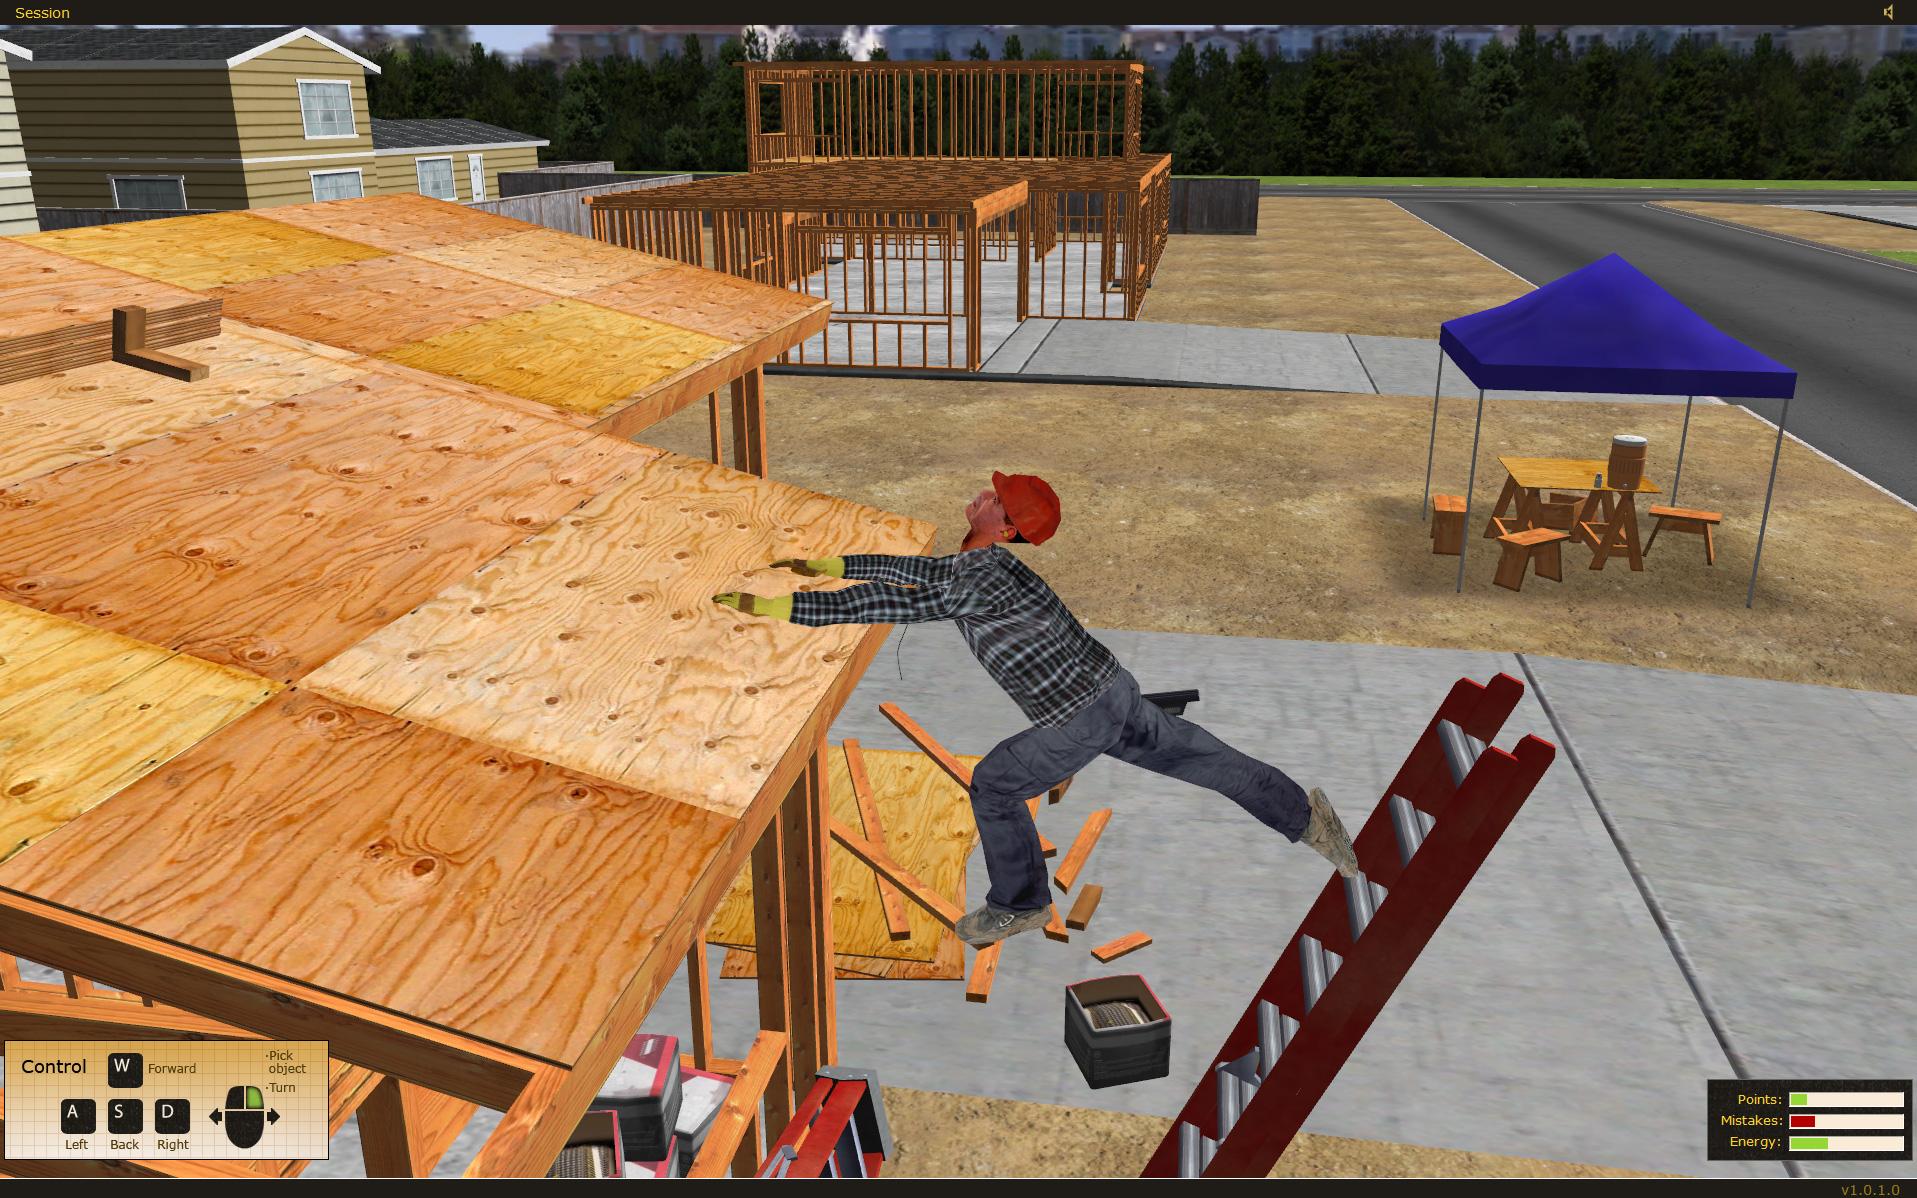 State Compensation Insurance Fund Ladder Safety Training Simulation Software